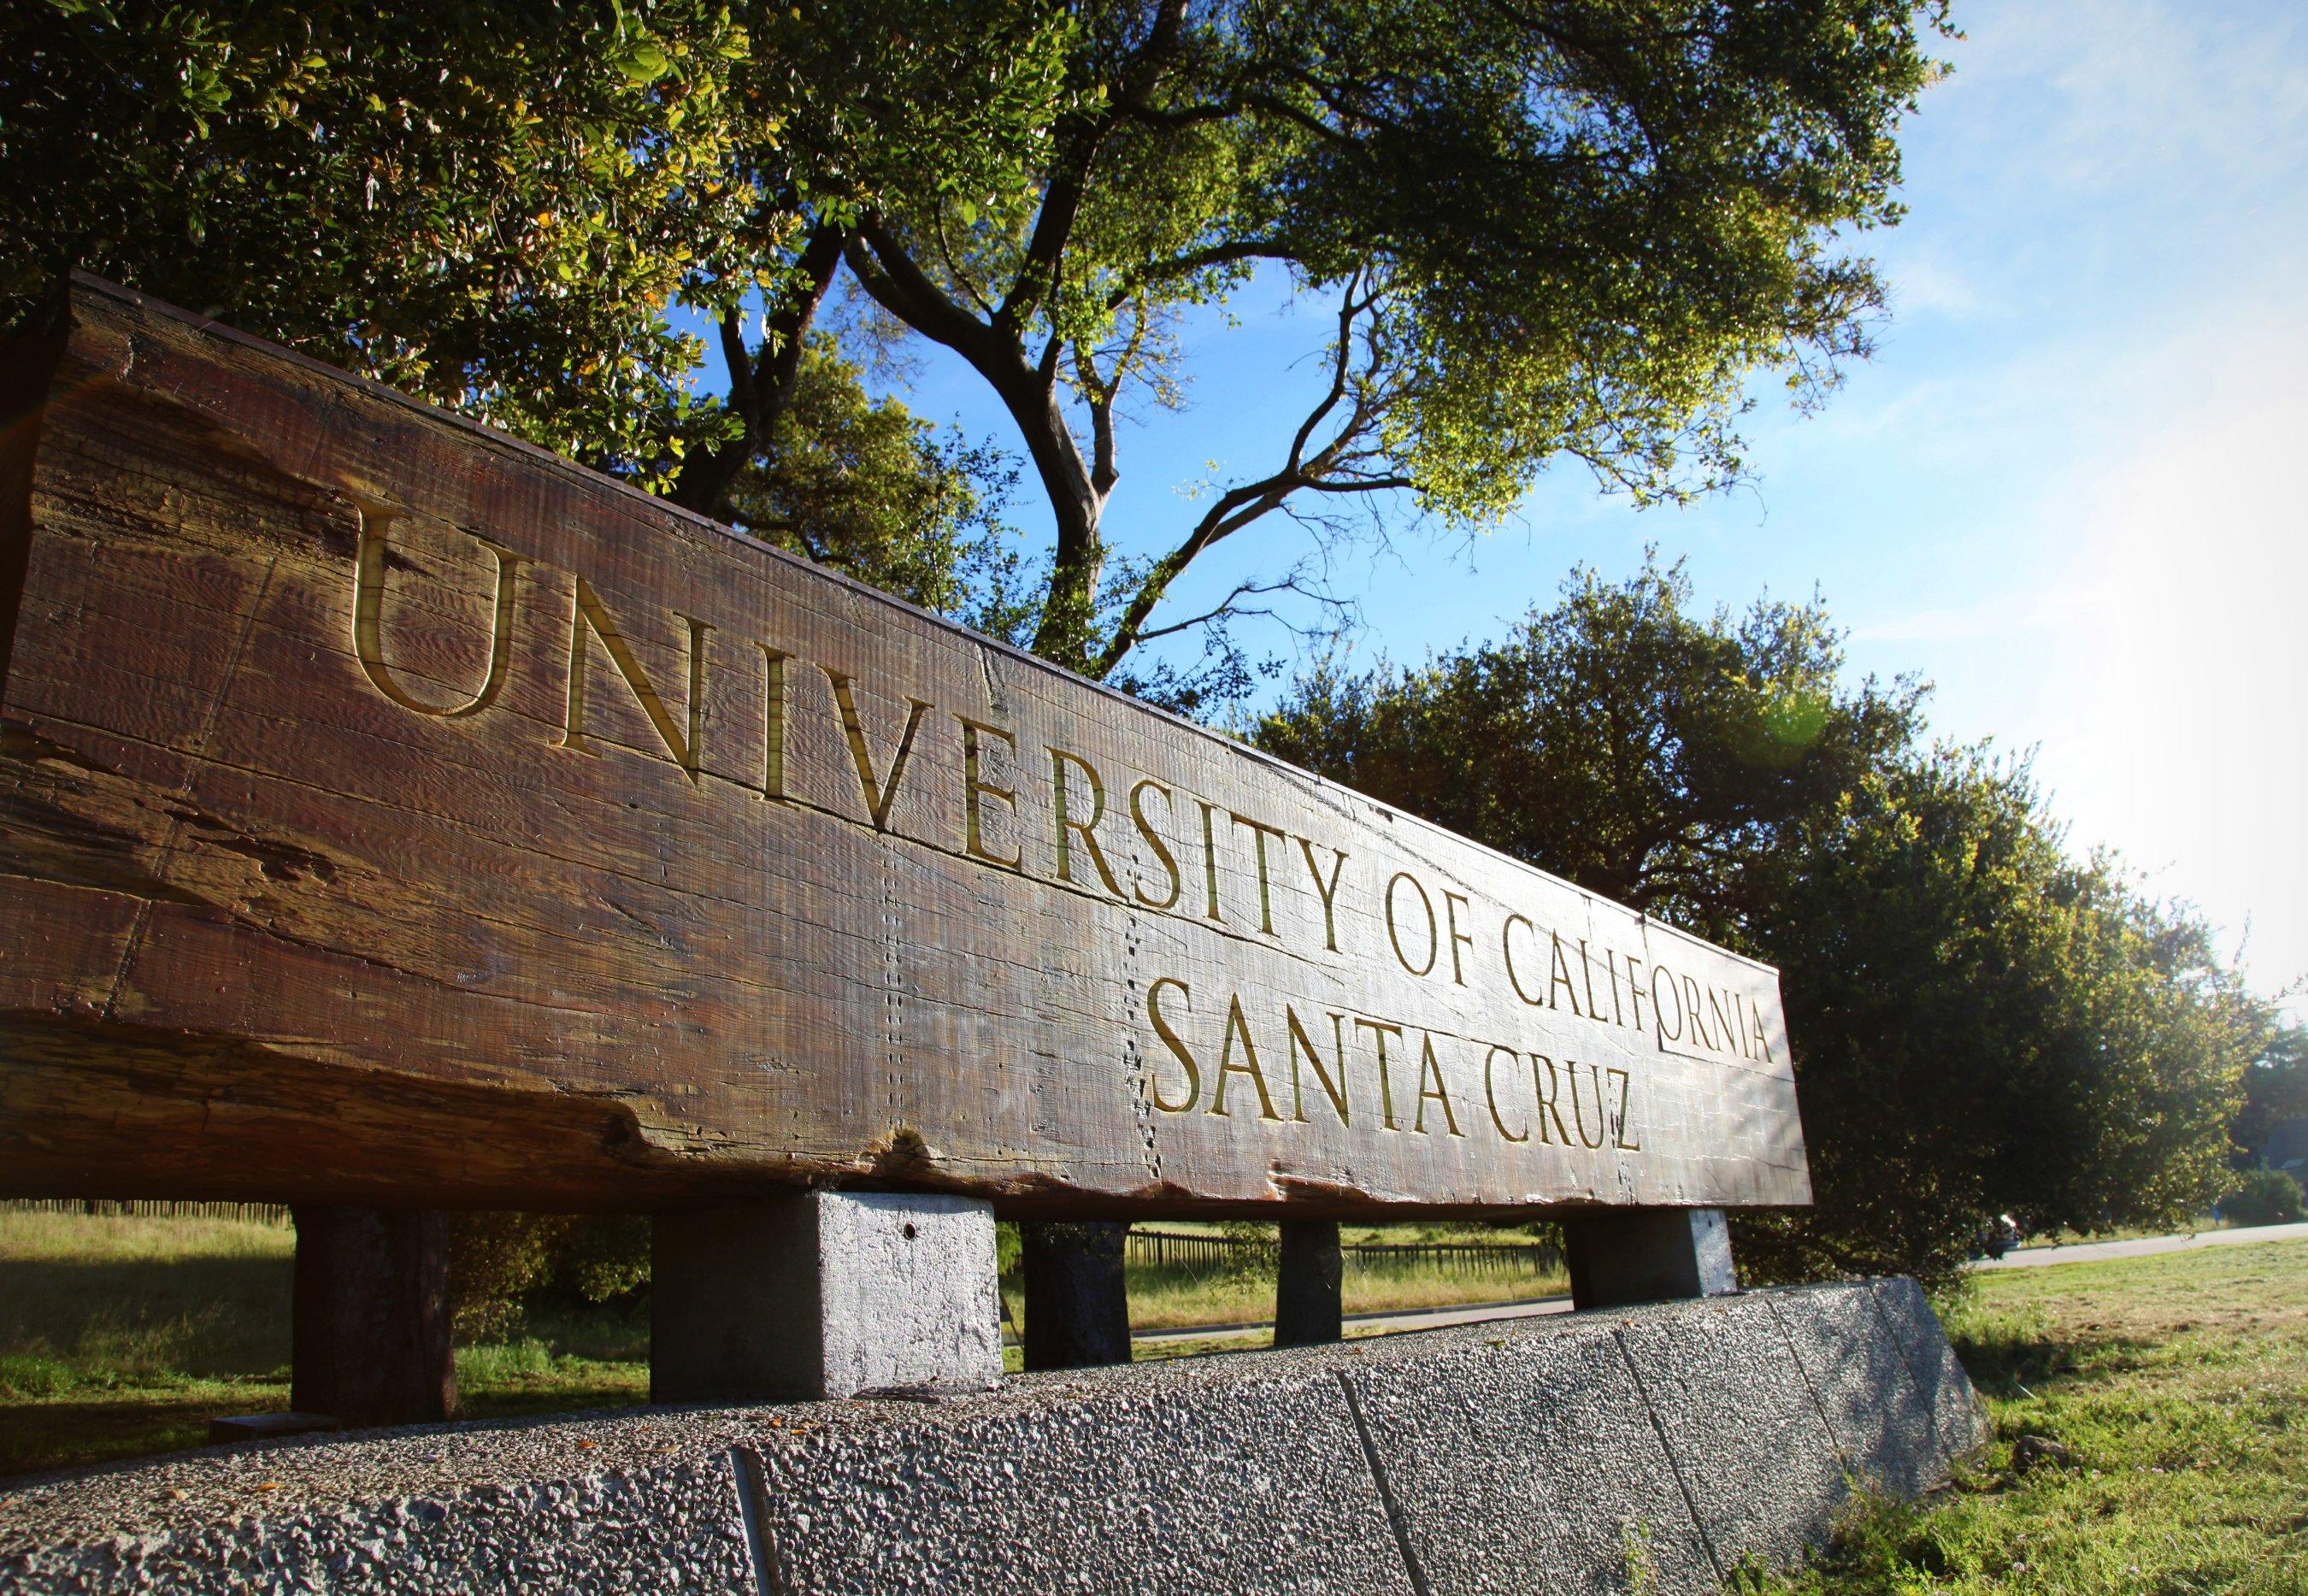 University of california santa cruz entrance sign